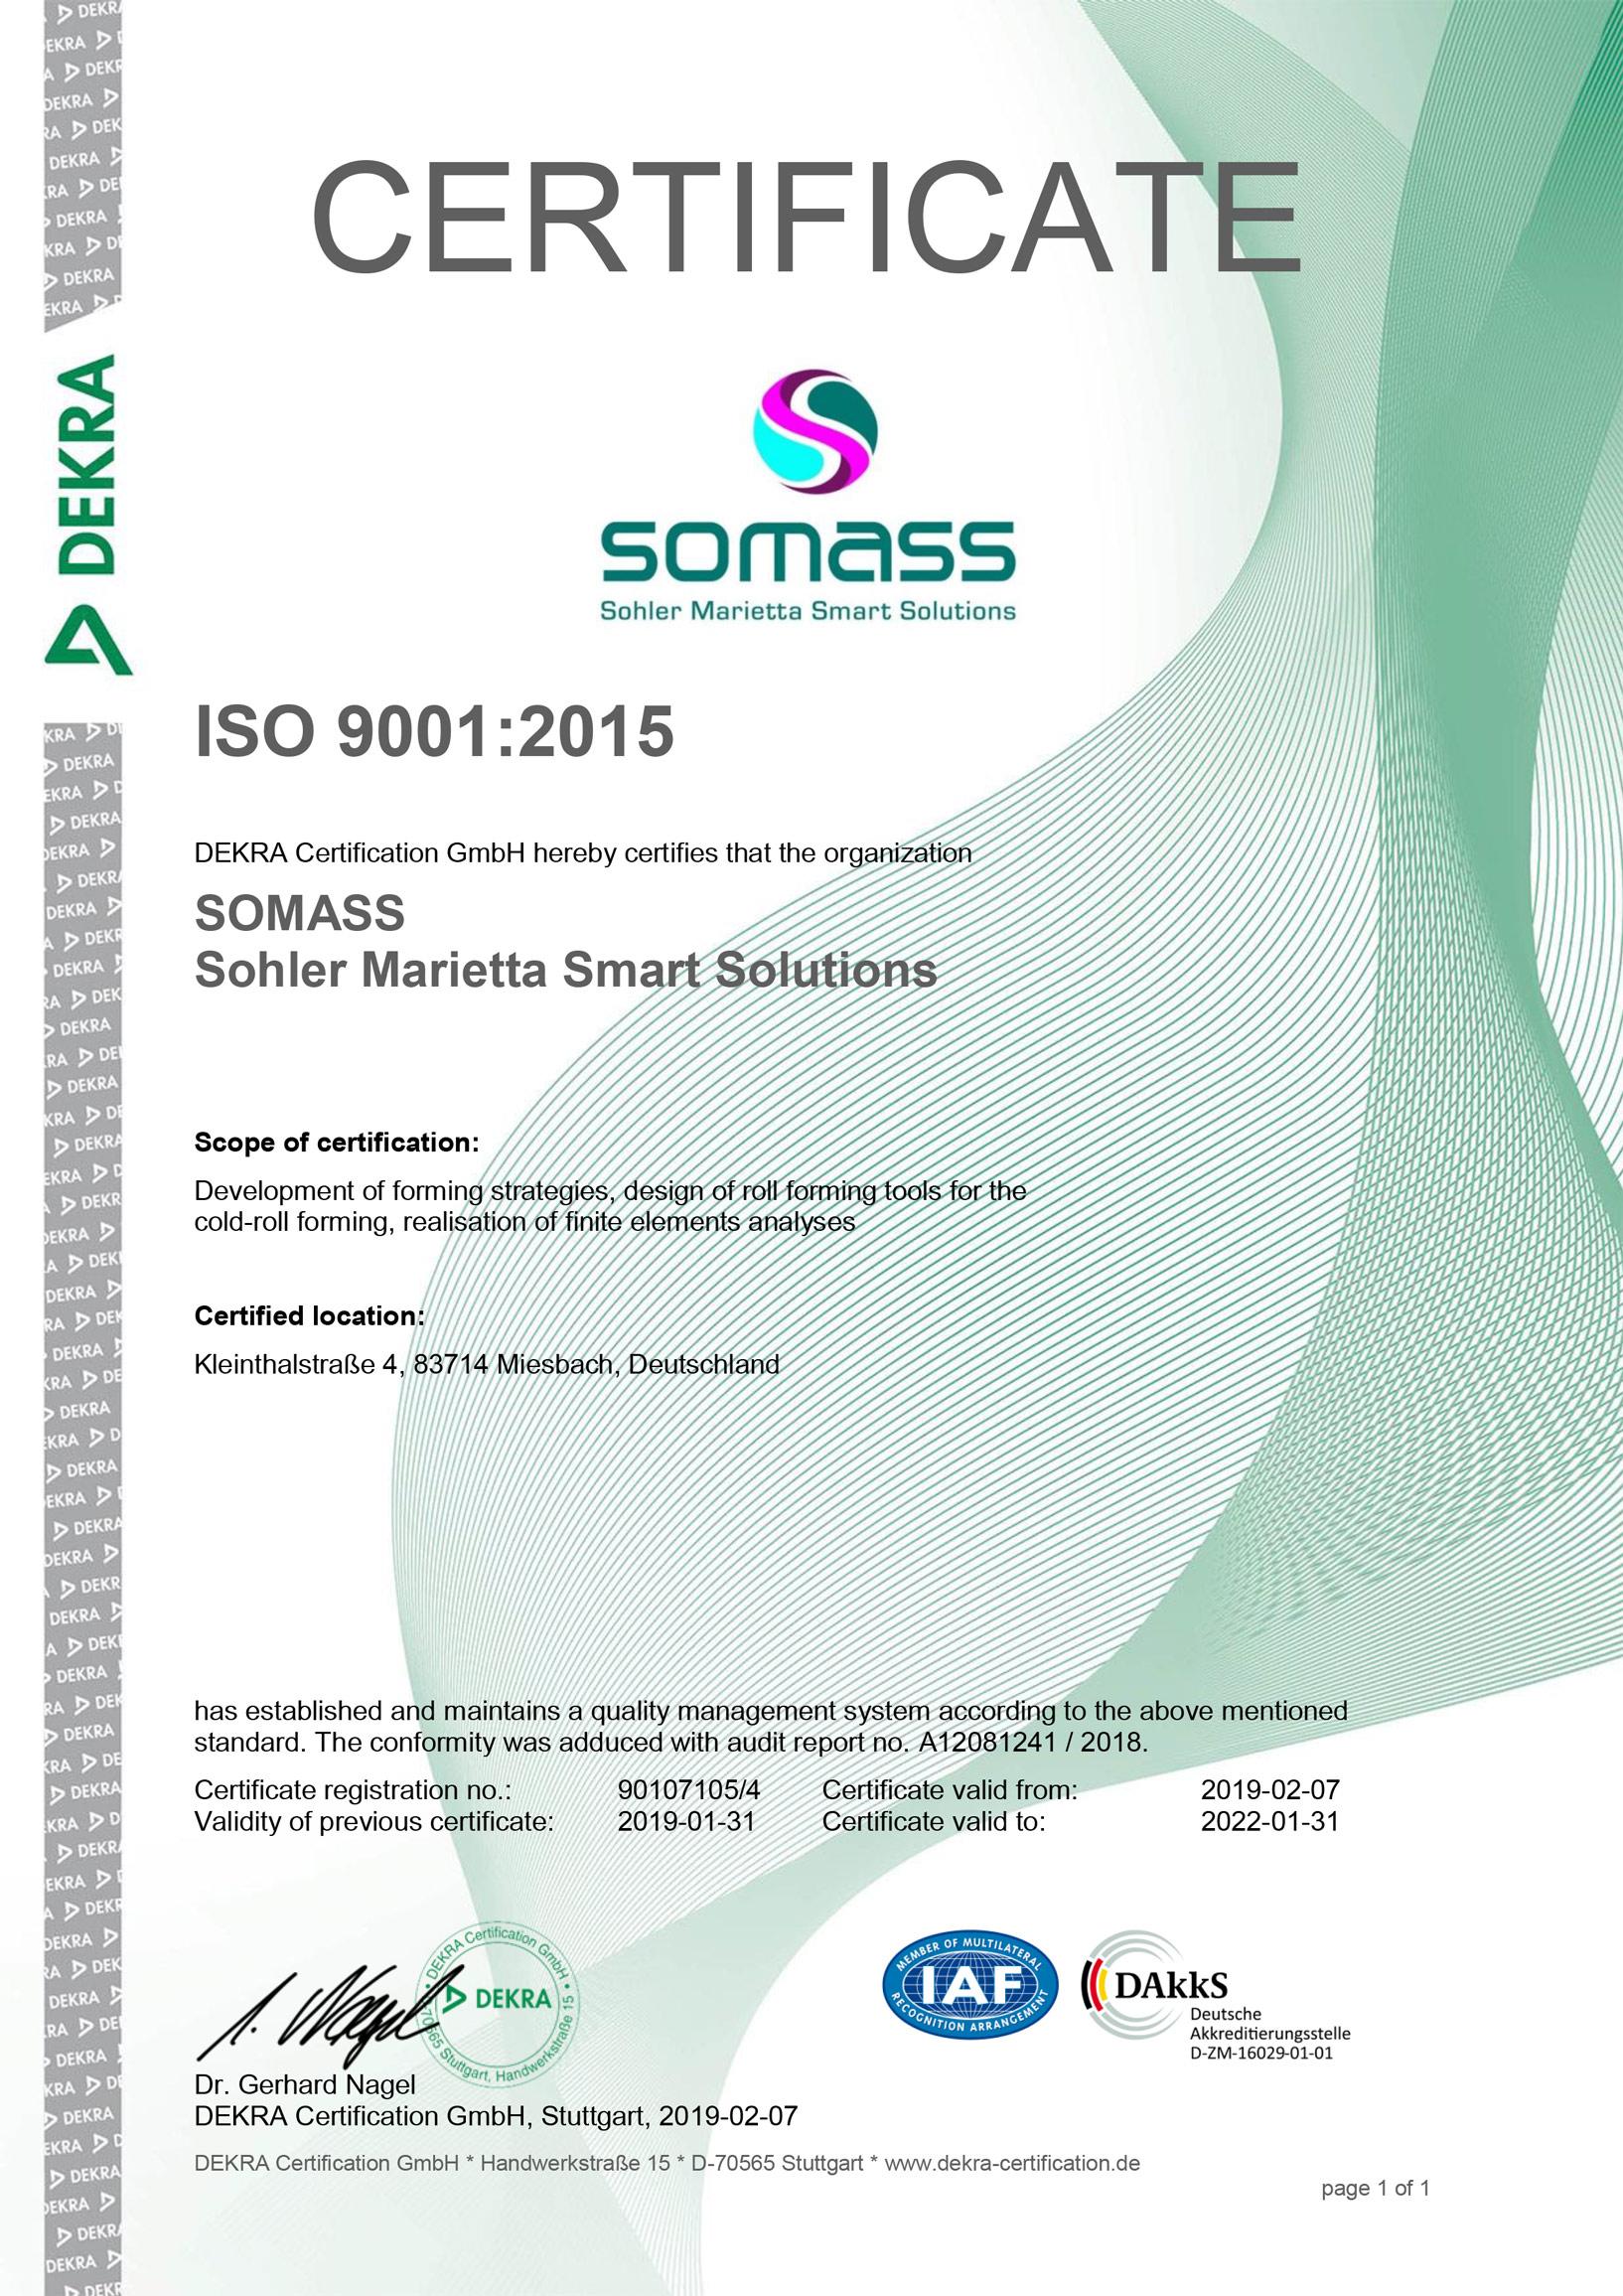 Zertifikat-RZ-90107105_4-eng